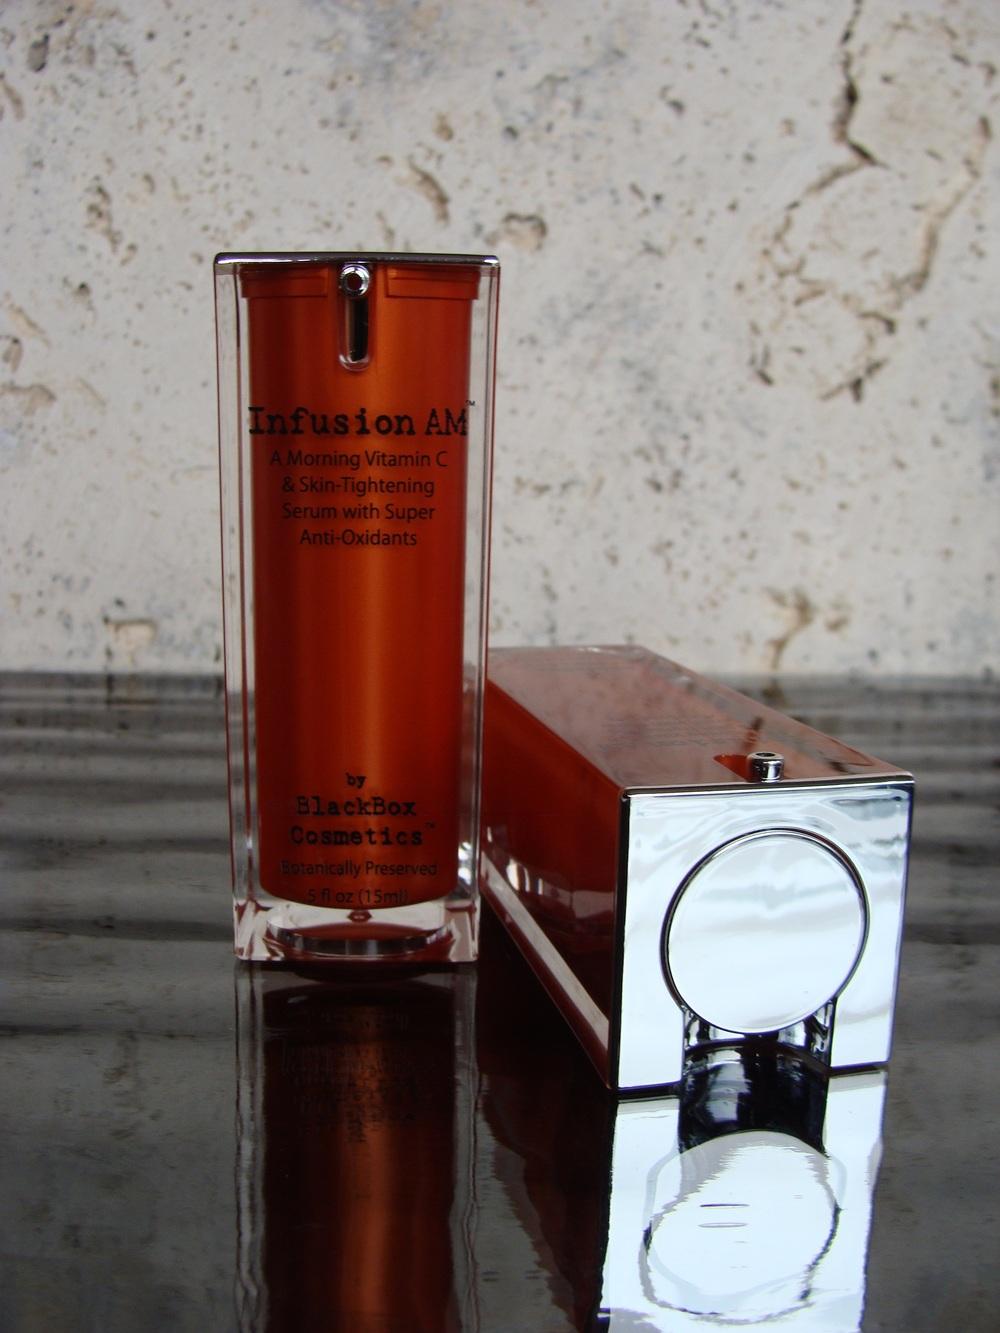 BlackBox Cosmetics Infusion AM